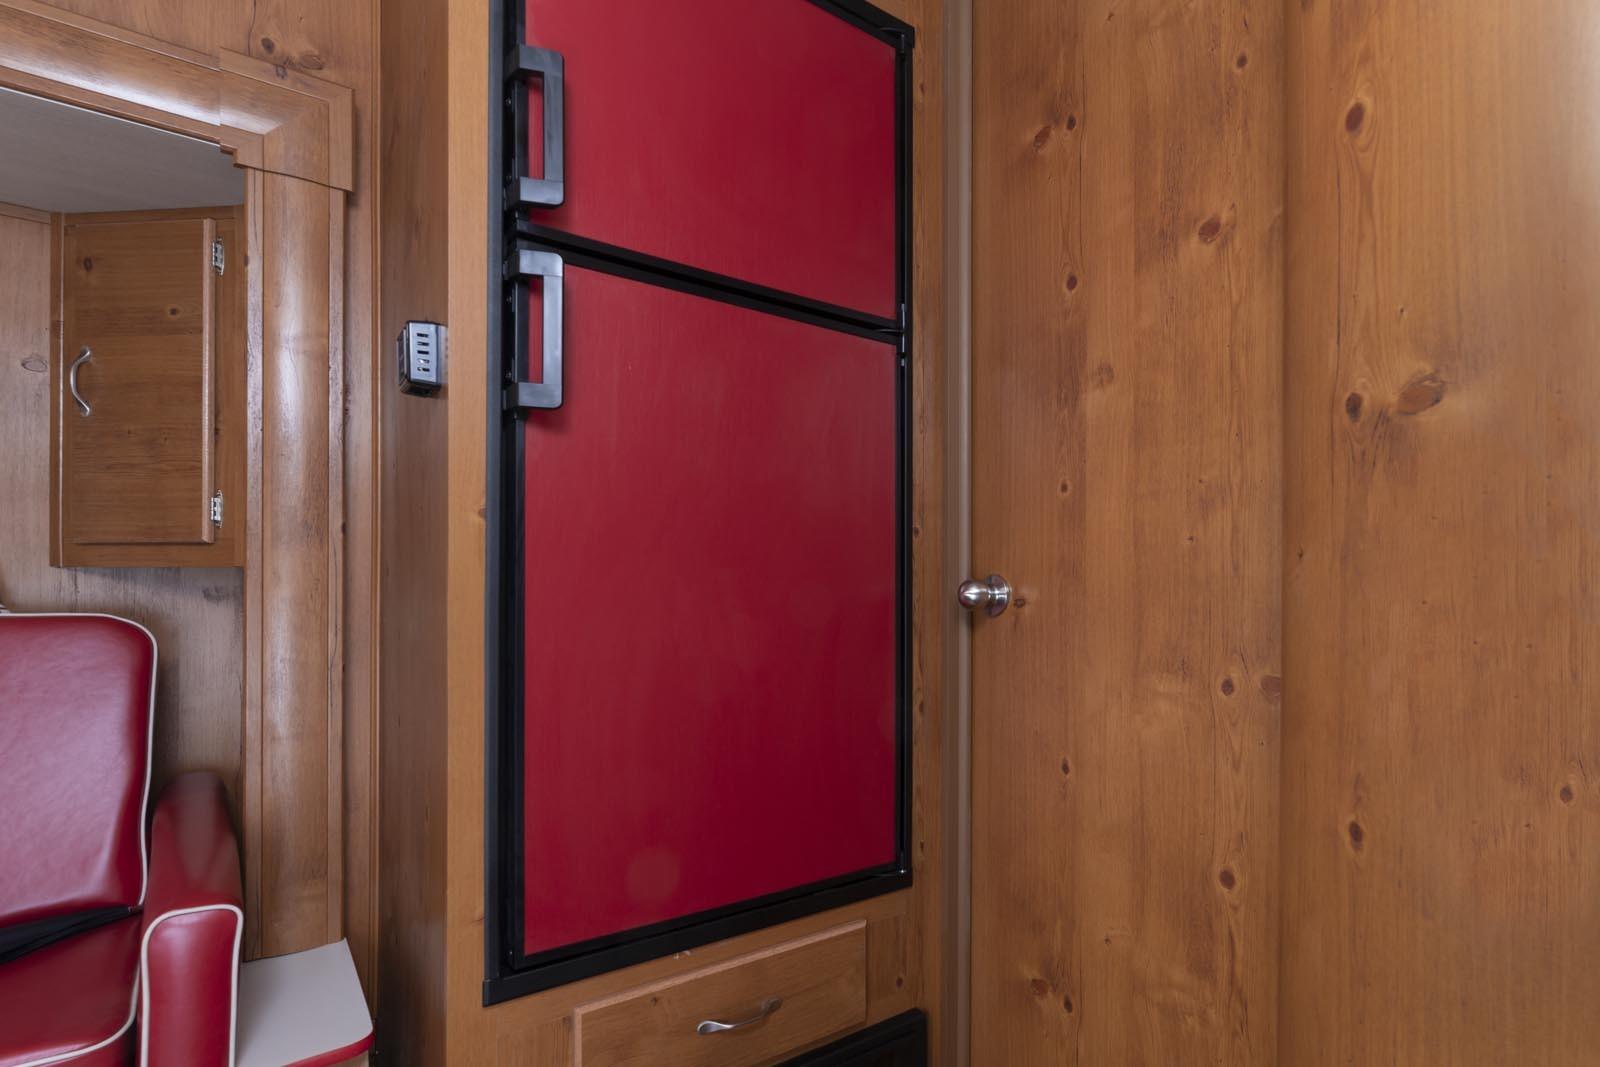 21 23rss crim fridge